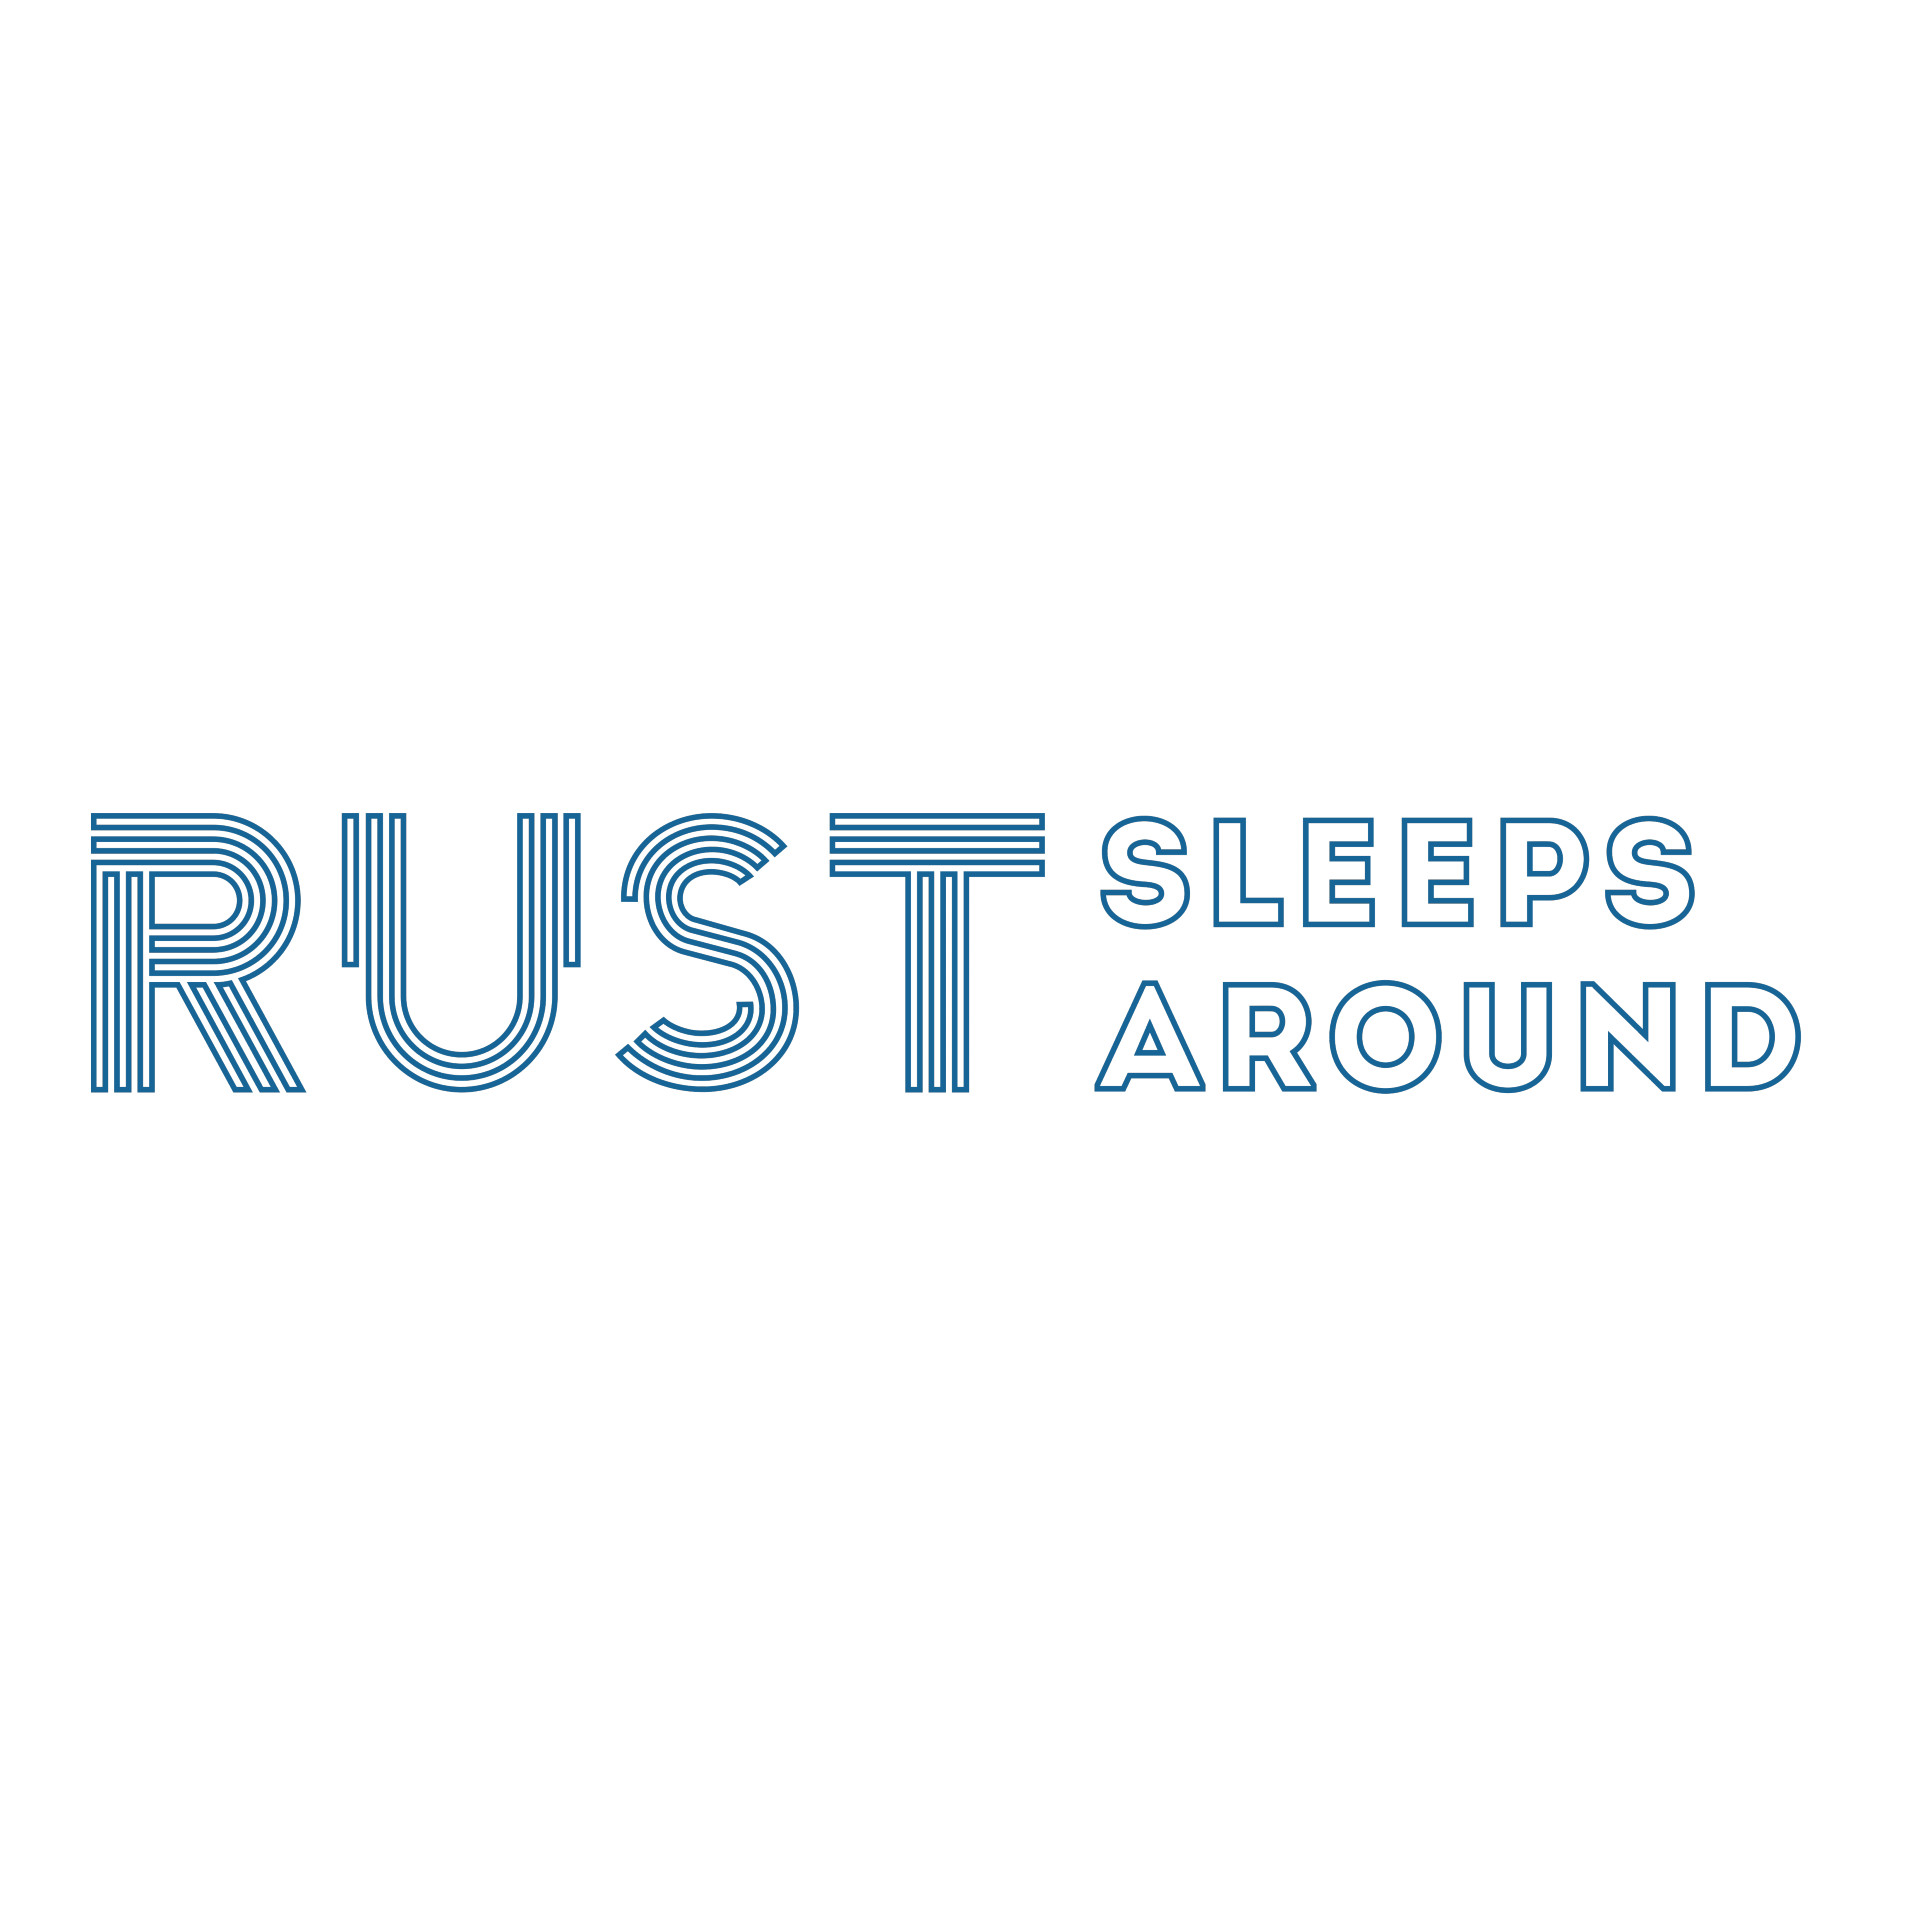 RUST Sleeps Around